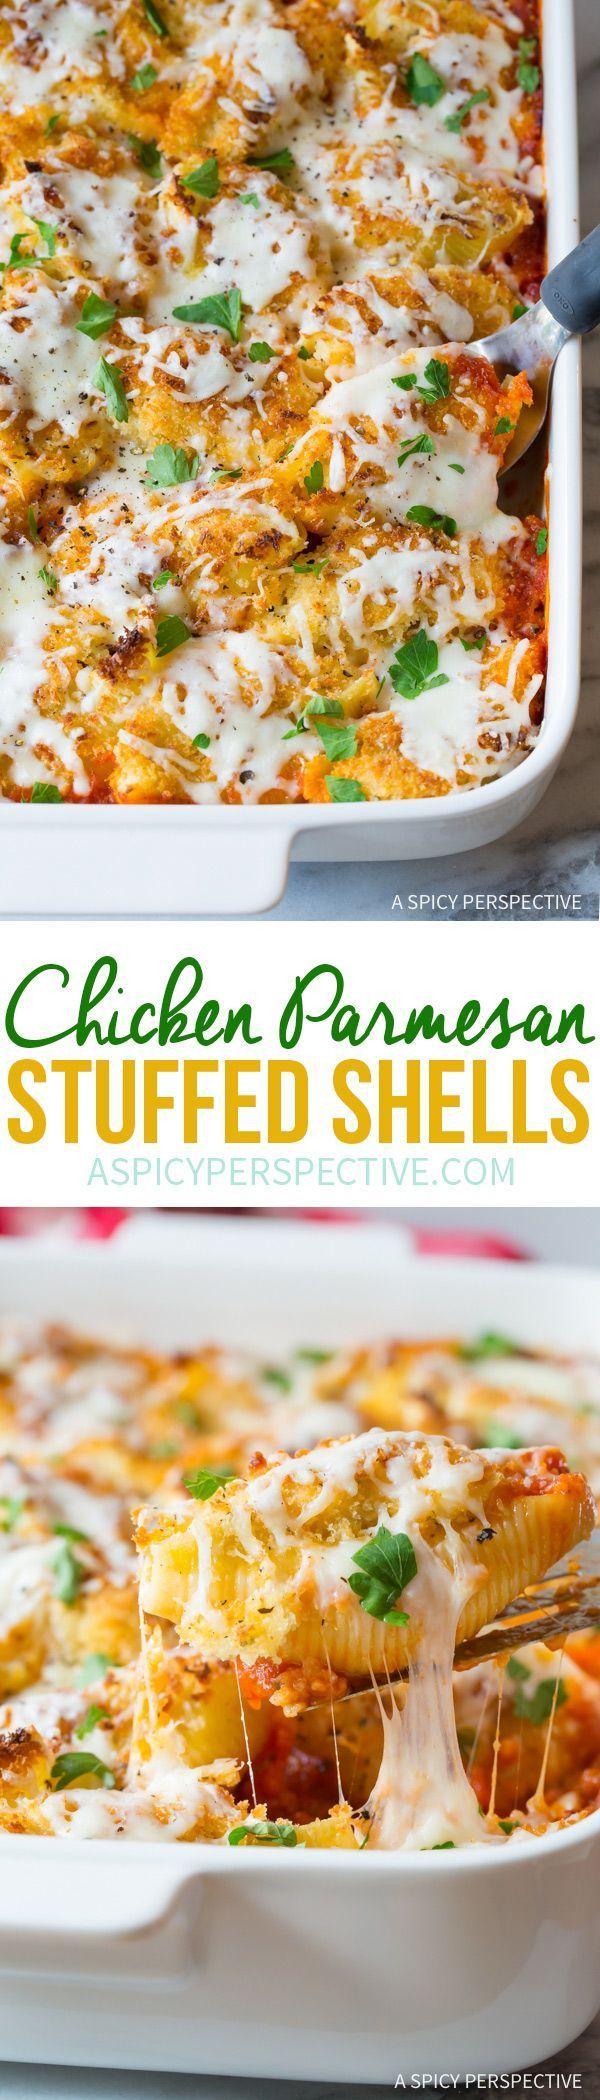 Perfect Chicken Parmesan Stuffed Shells Recipe via /spicyperspectiv/ (Baking Pasta Rose)